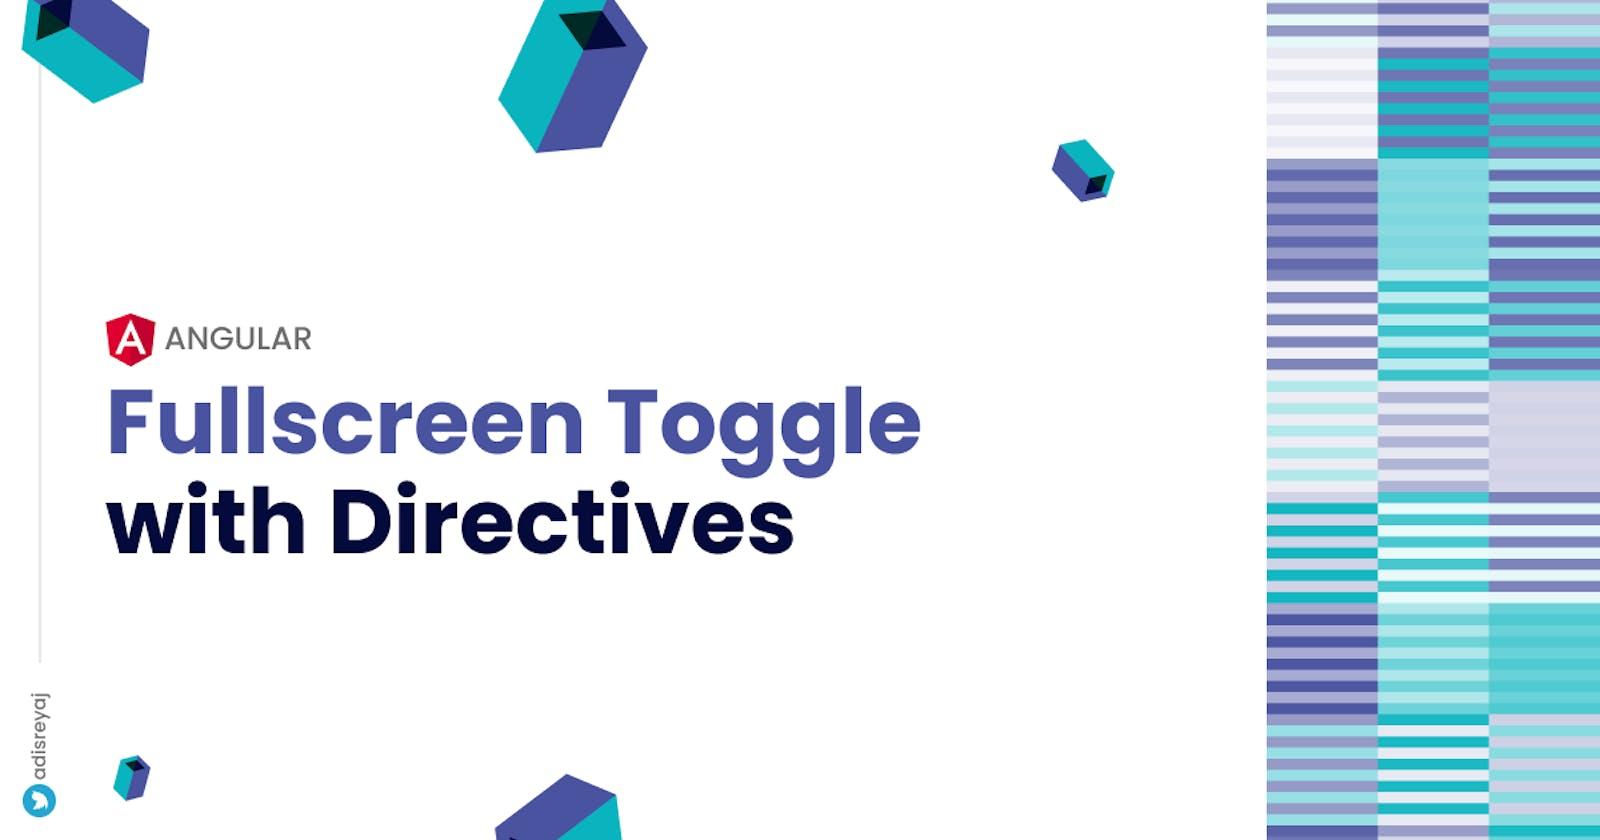 Fullscreen toggle functionality in Angular using Directives.